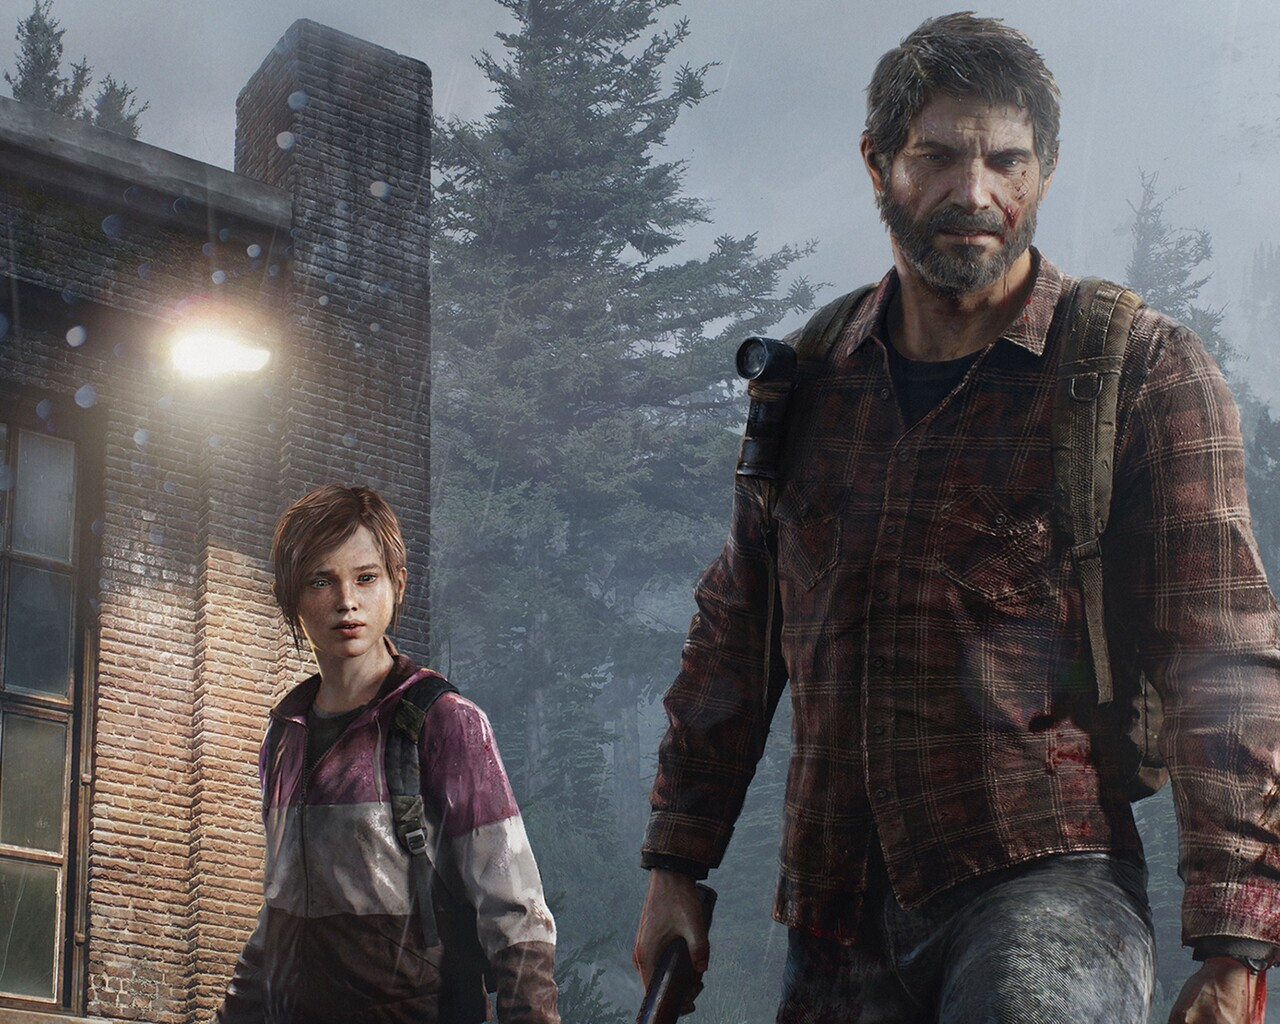 1280x1024 The Last Of Us Joel Eliie 1280x1024 Resolution Hd 4k